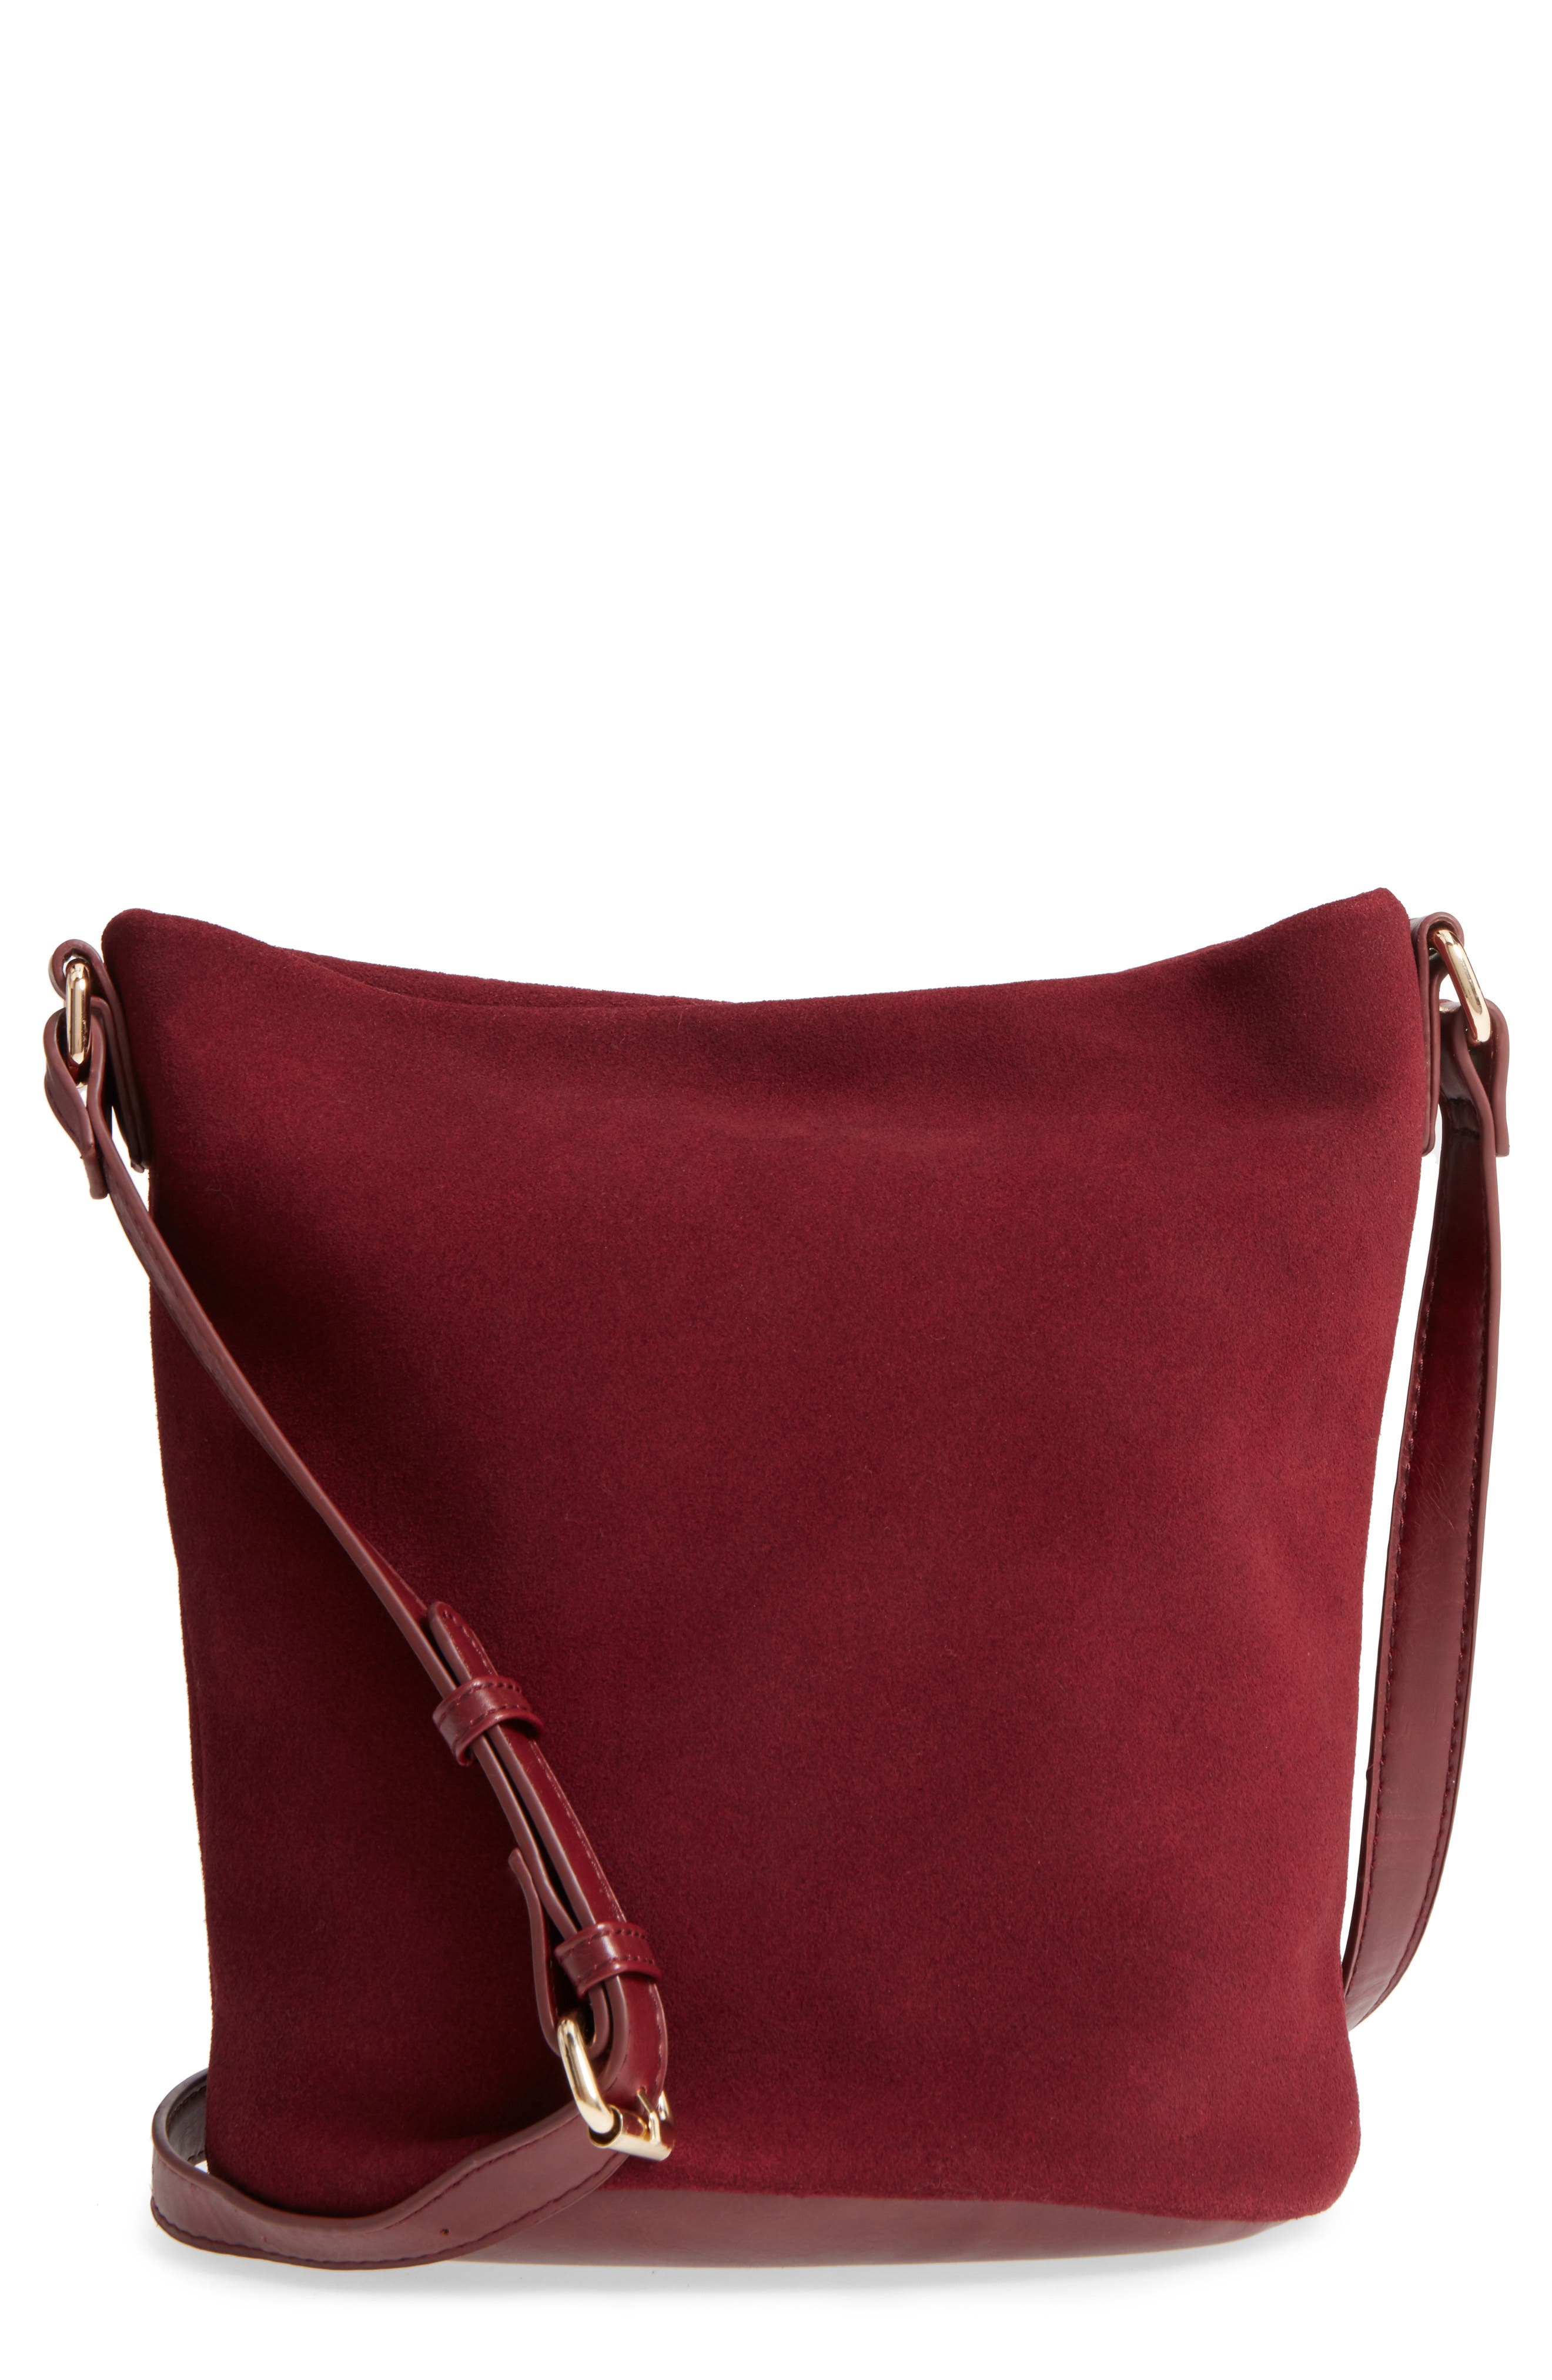 Main Image - Sole Society Lana Slouchy Suede Crossbody Bag